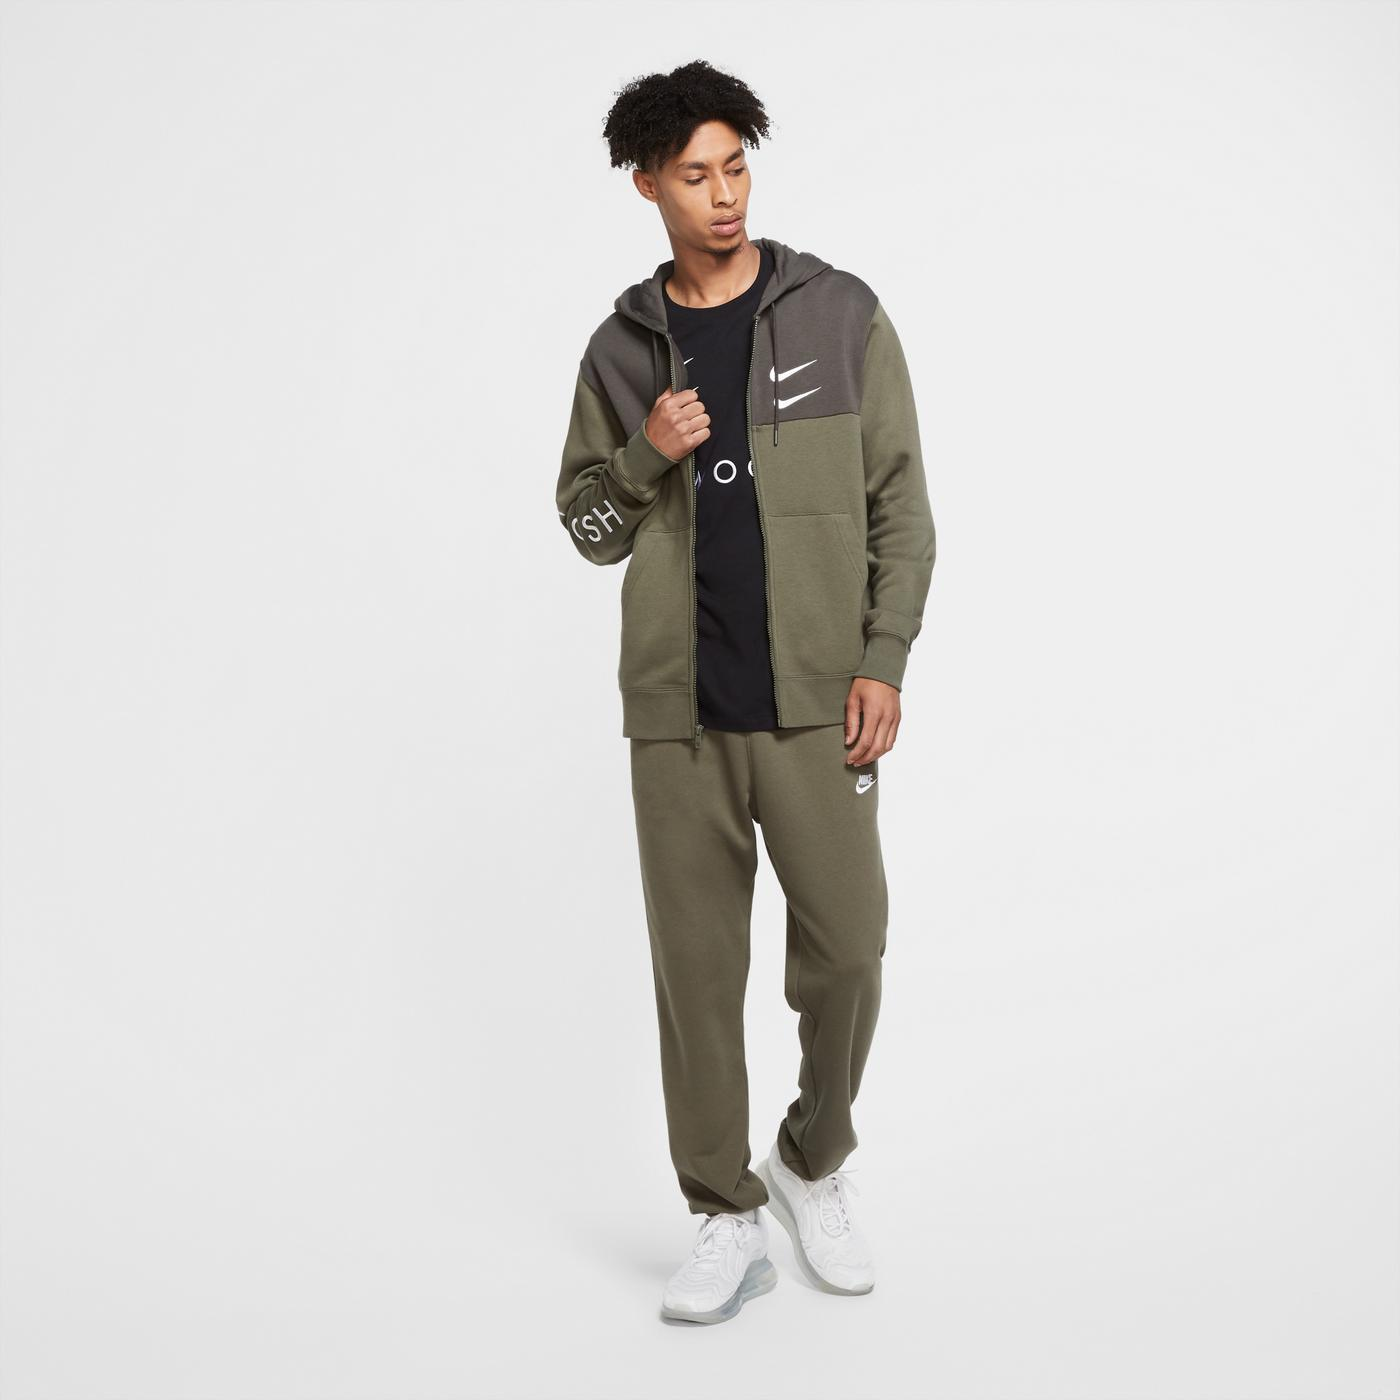 Nike Sportswear Swoosh Erkek Yeşil Sweatshirt